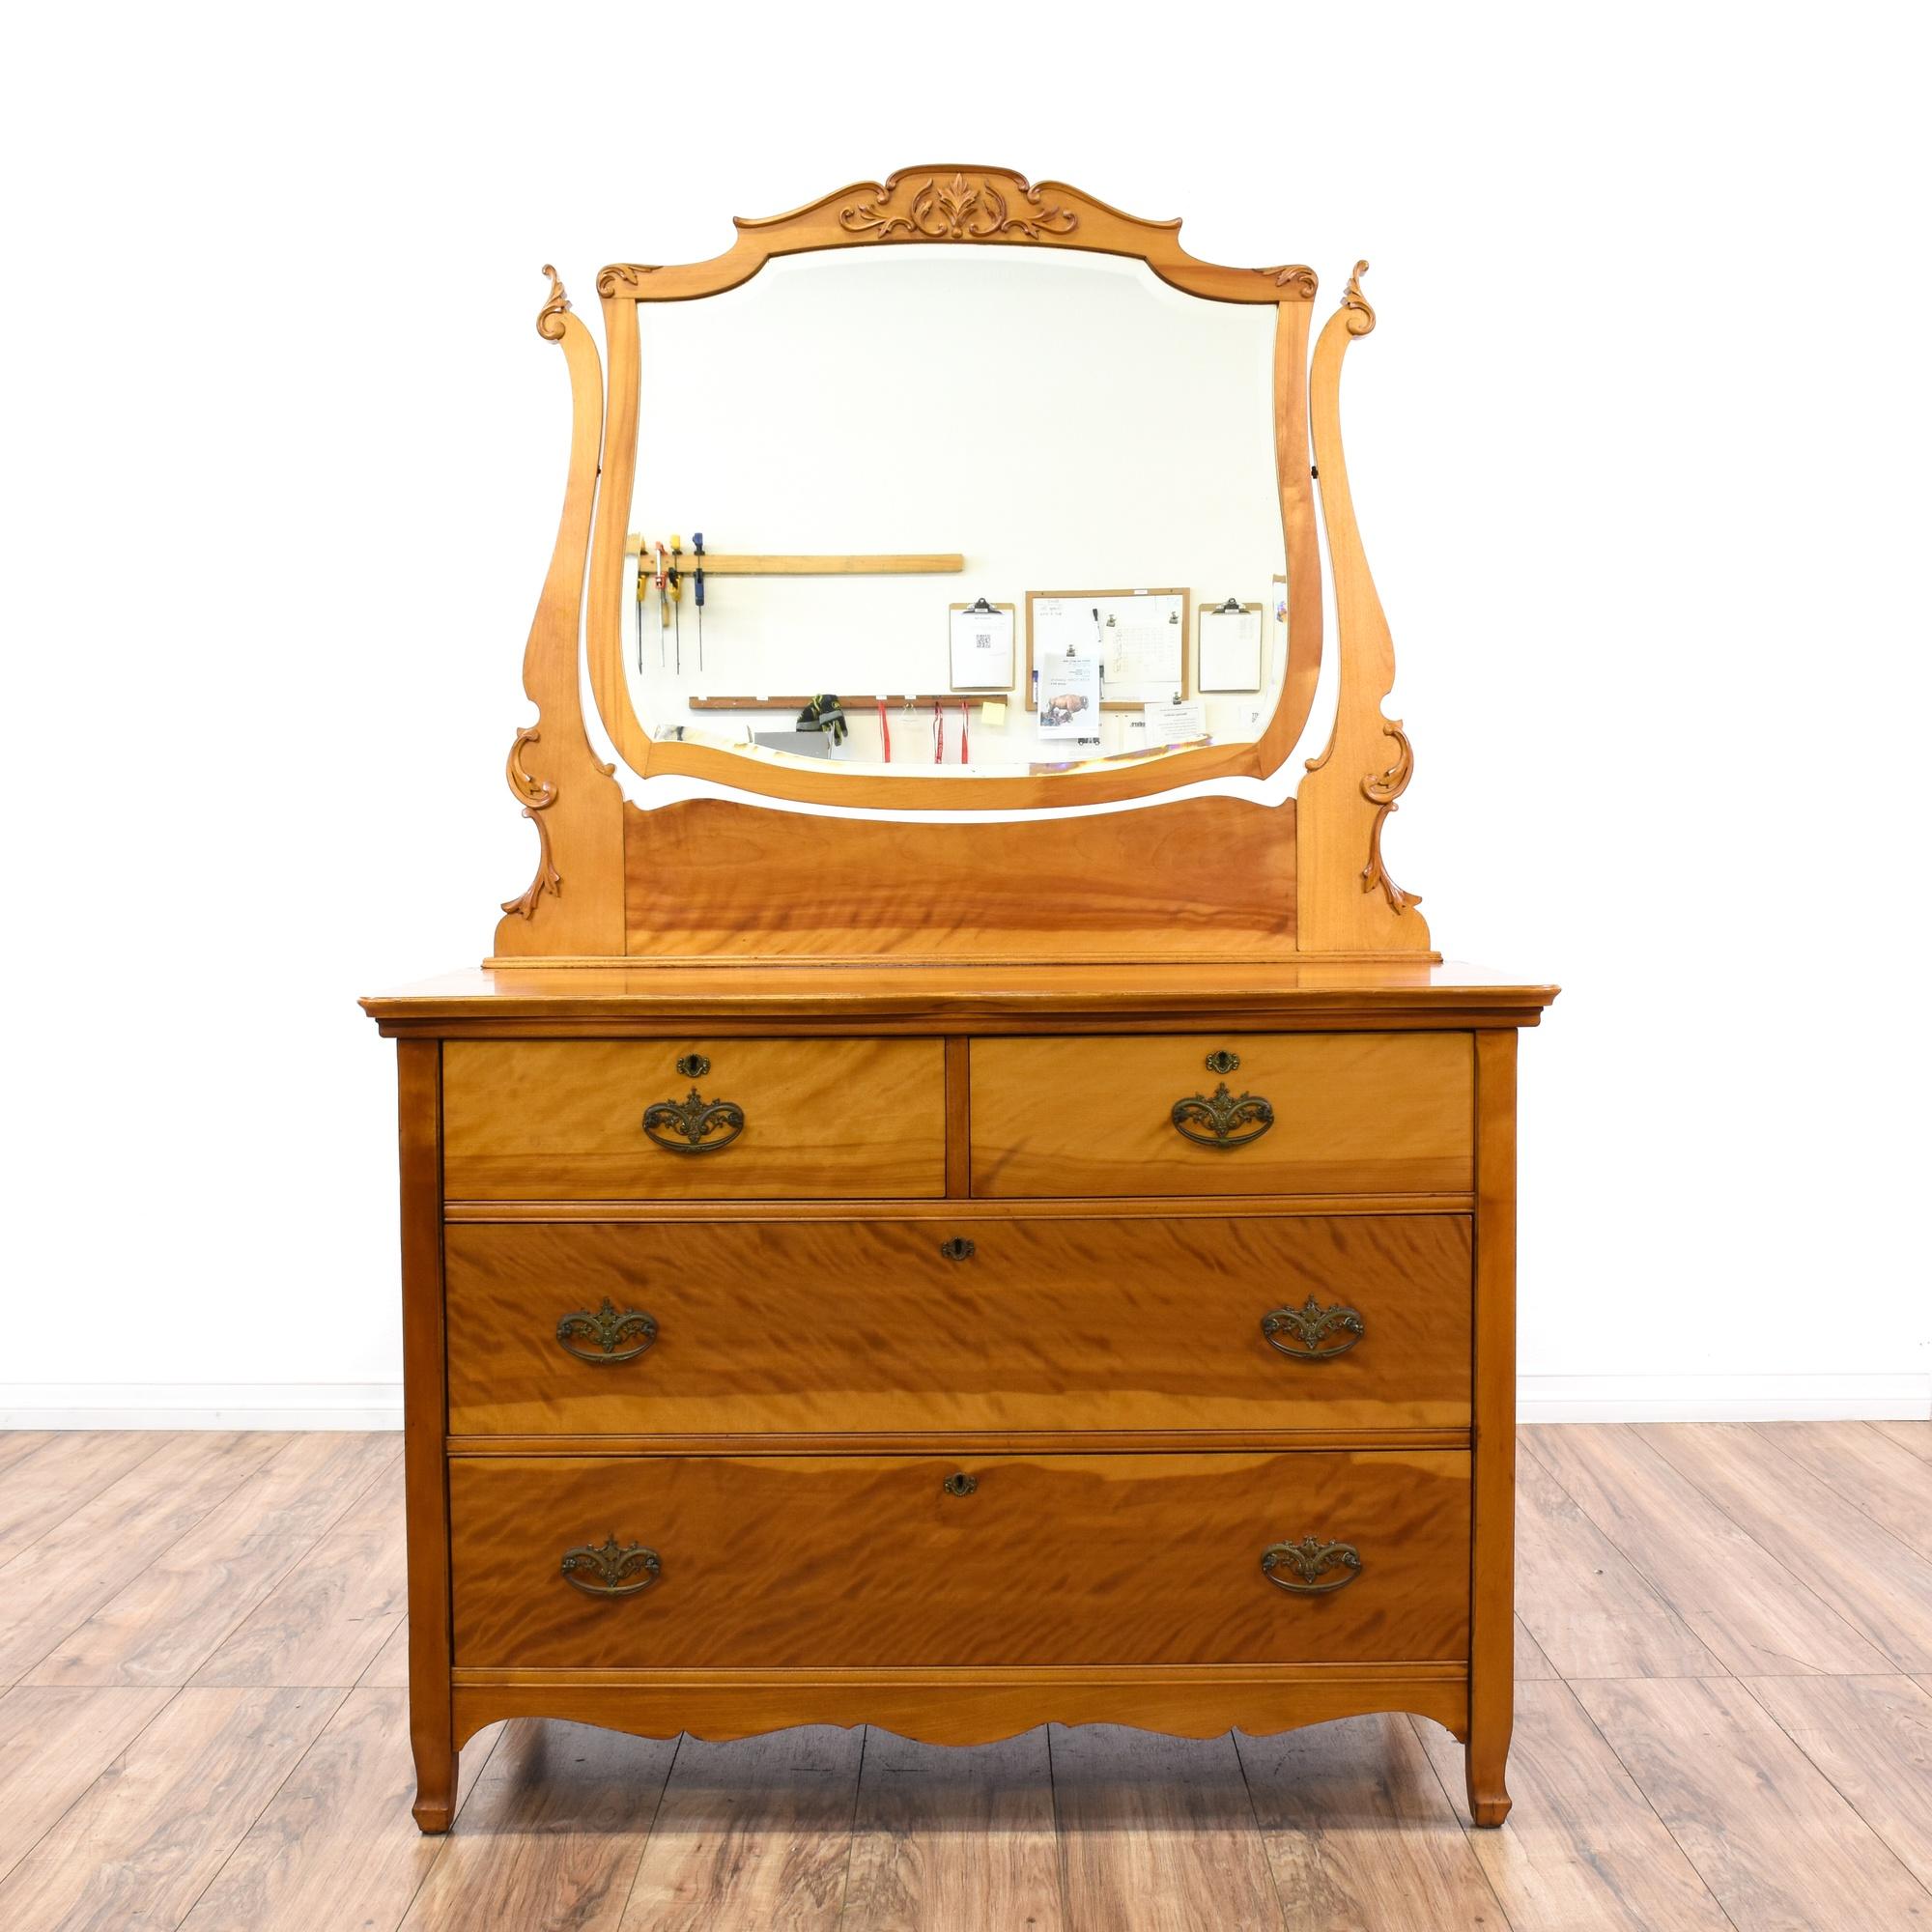 Antique Flame Birch Vanity Dresser Loveseat Vintage